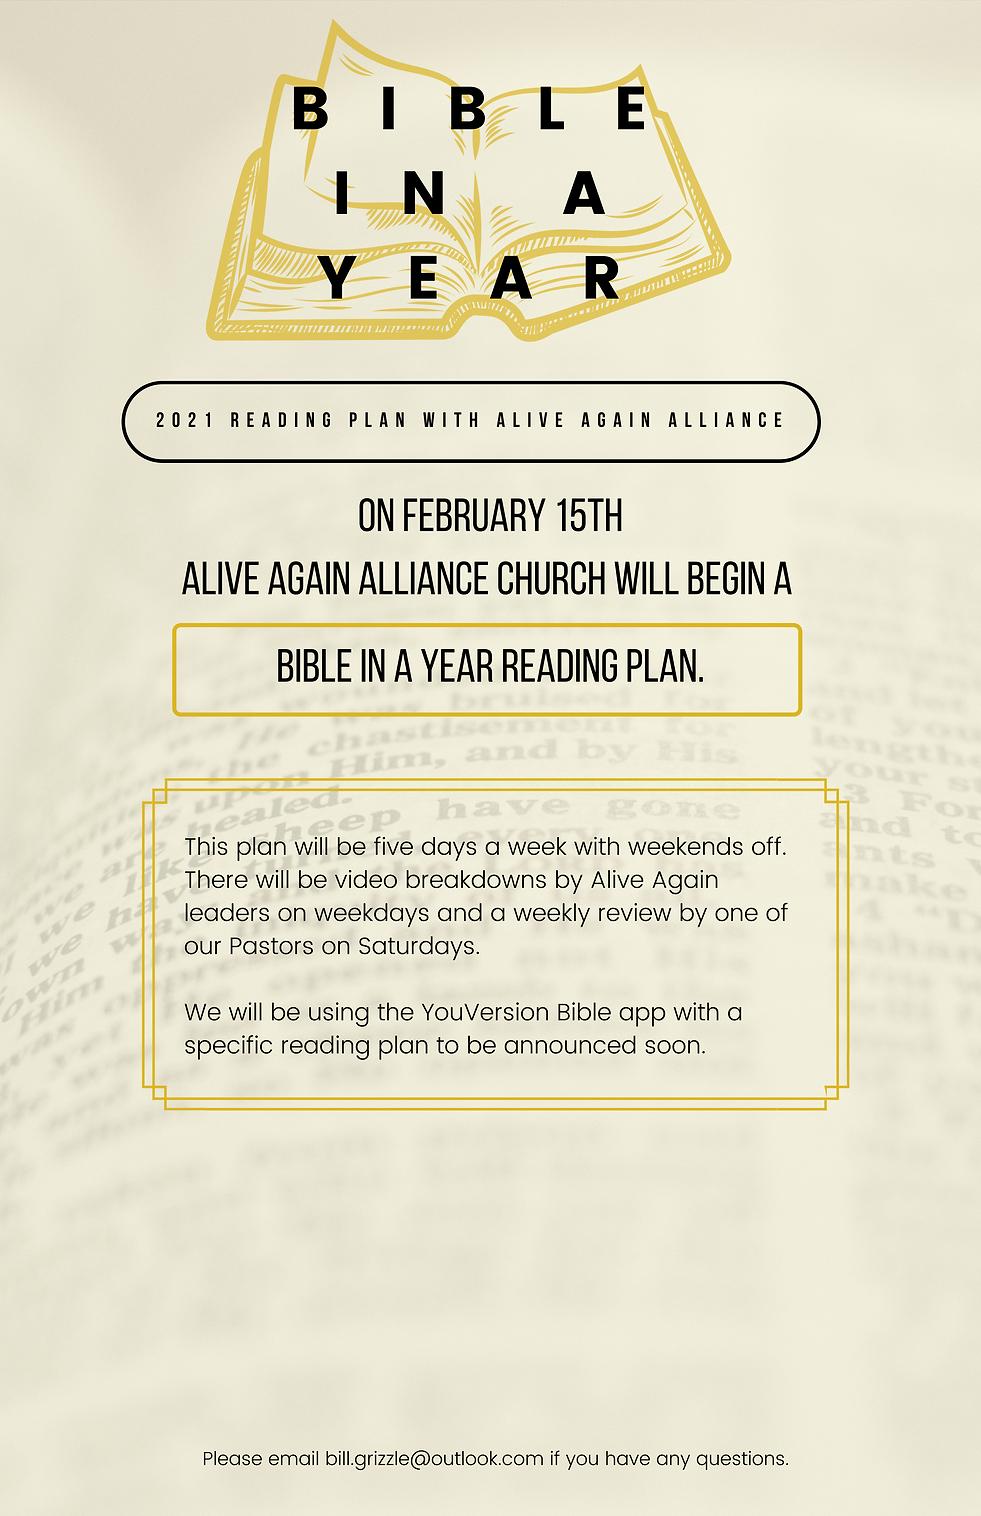 On February 15th - Alive Again will begi